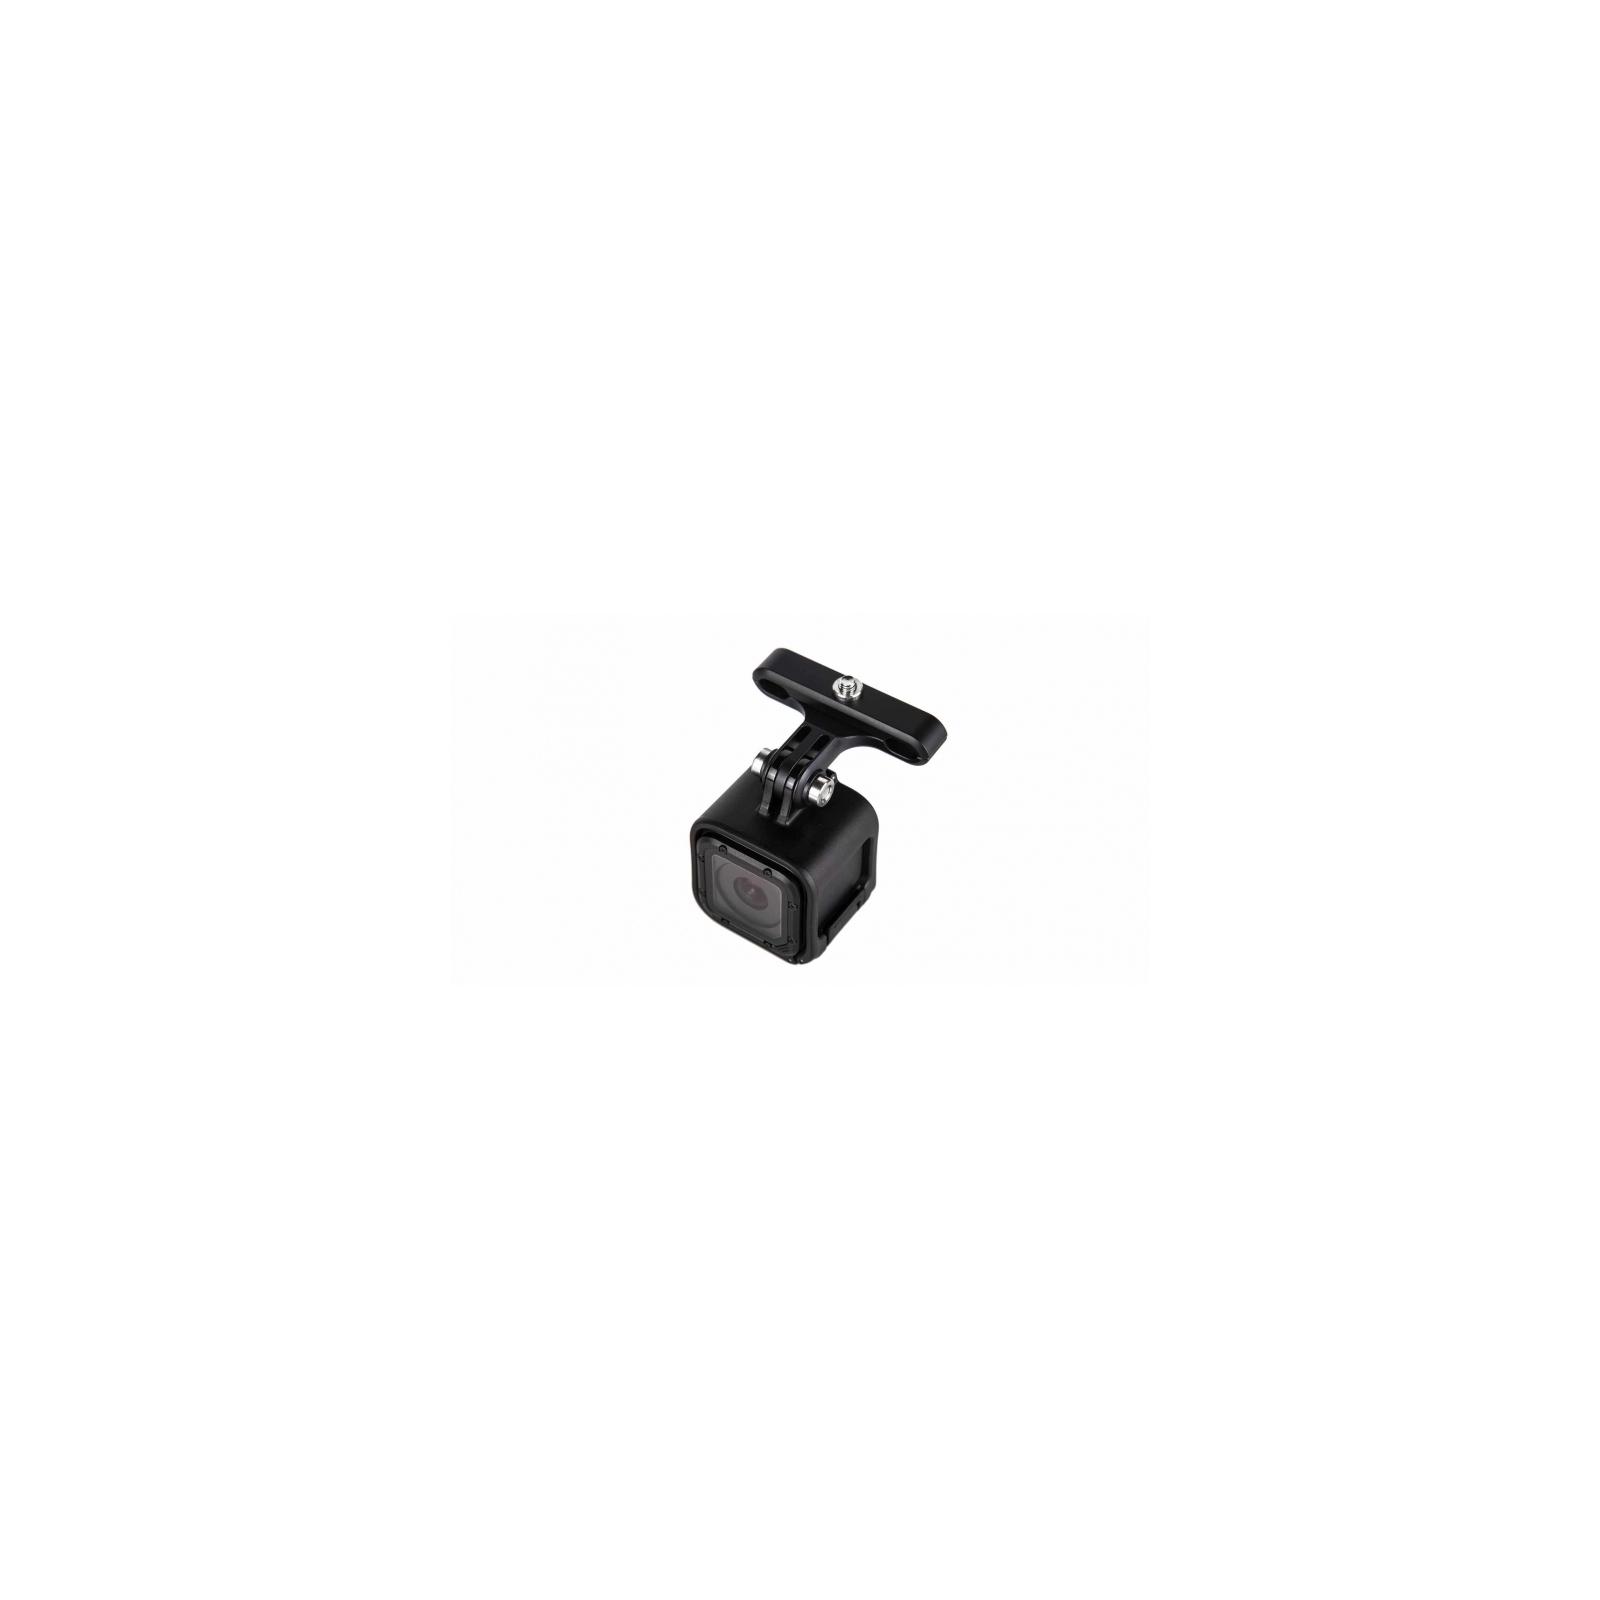 Аксессуар к экшн-камерам GoPro Pro Seat Rail Mount (AMBSM-001) изображение 2